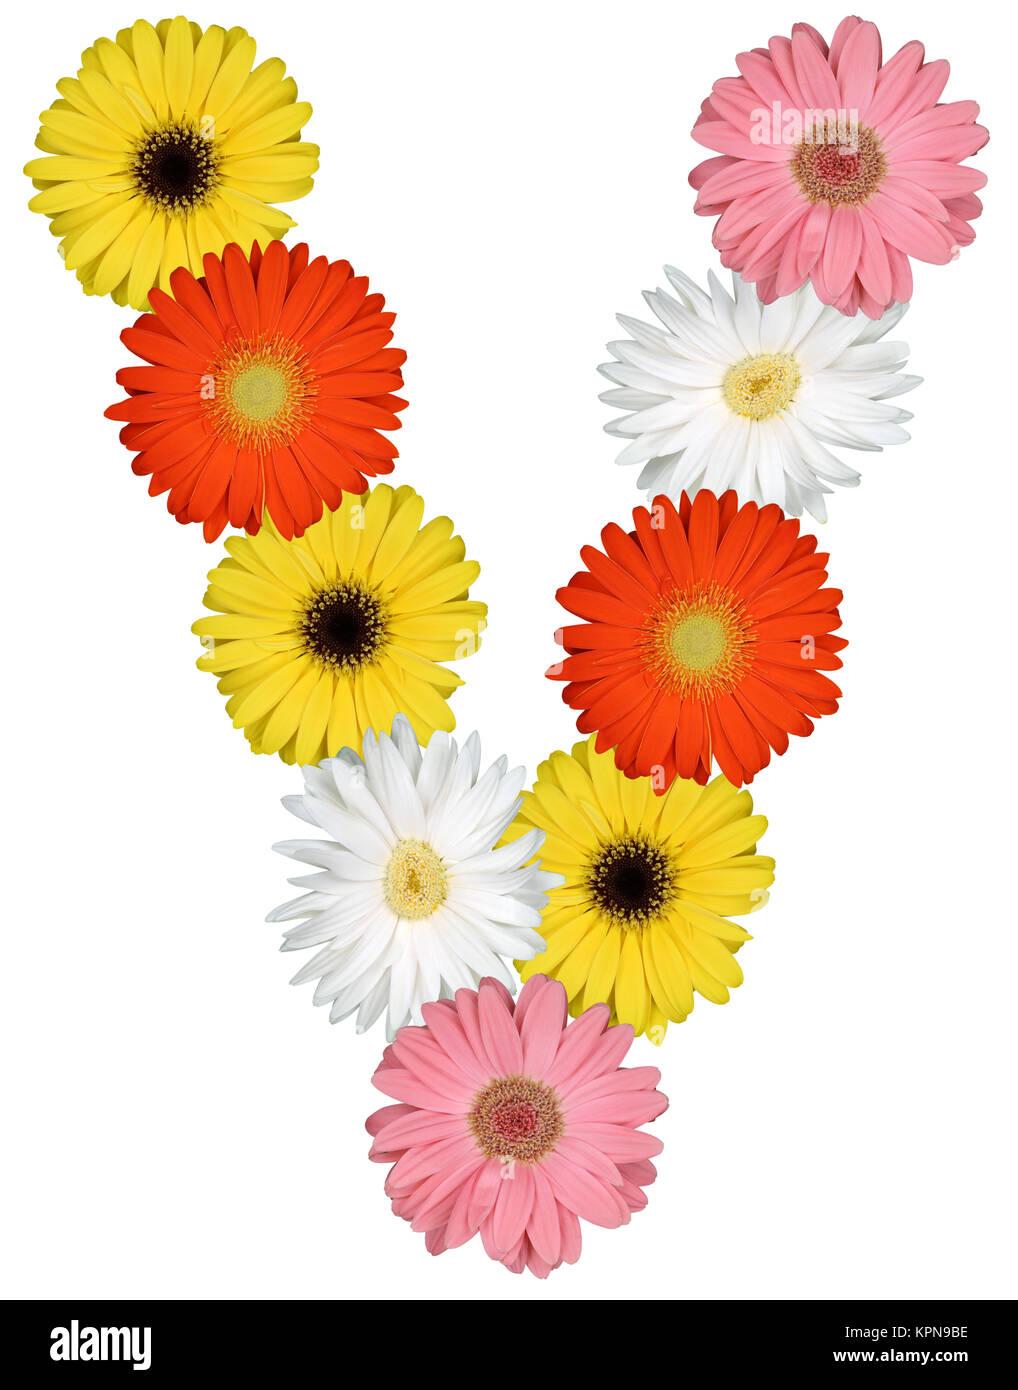 Letter v plant stock photos letter v plant stock images alamy letter v alphabet of flowers cut on white stock image thecheapjerseys Gallery